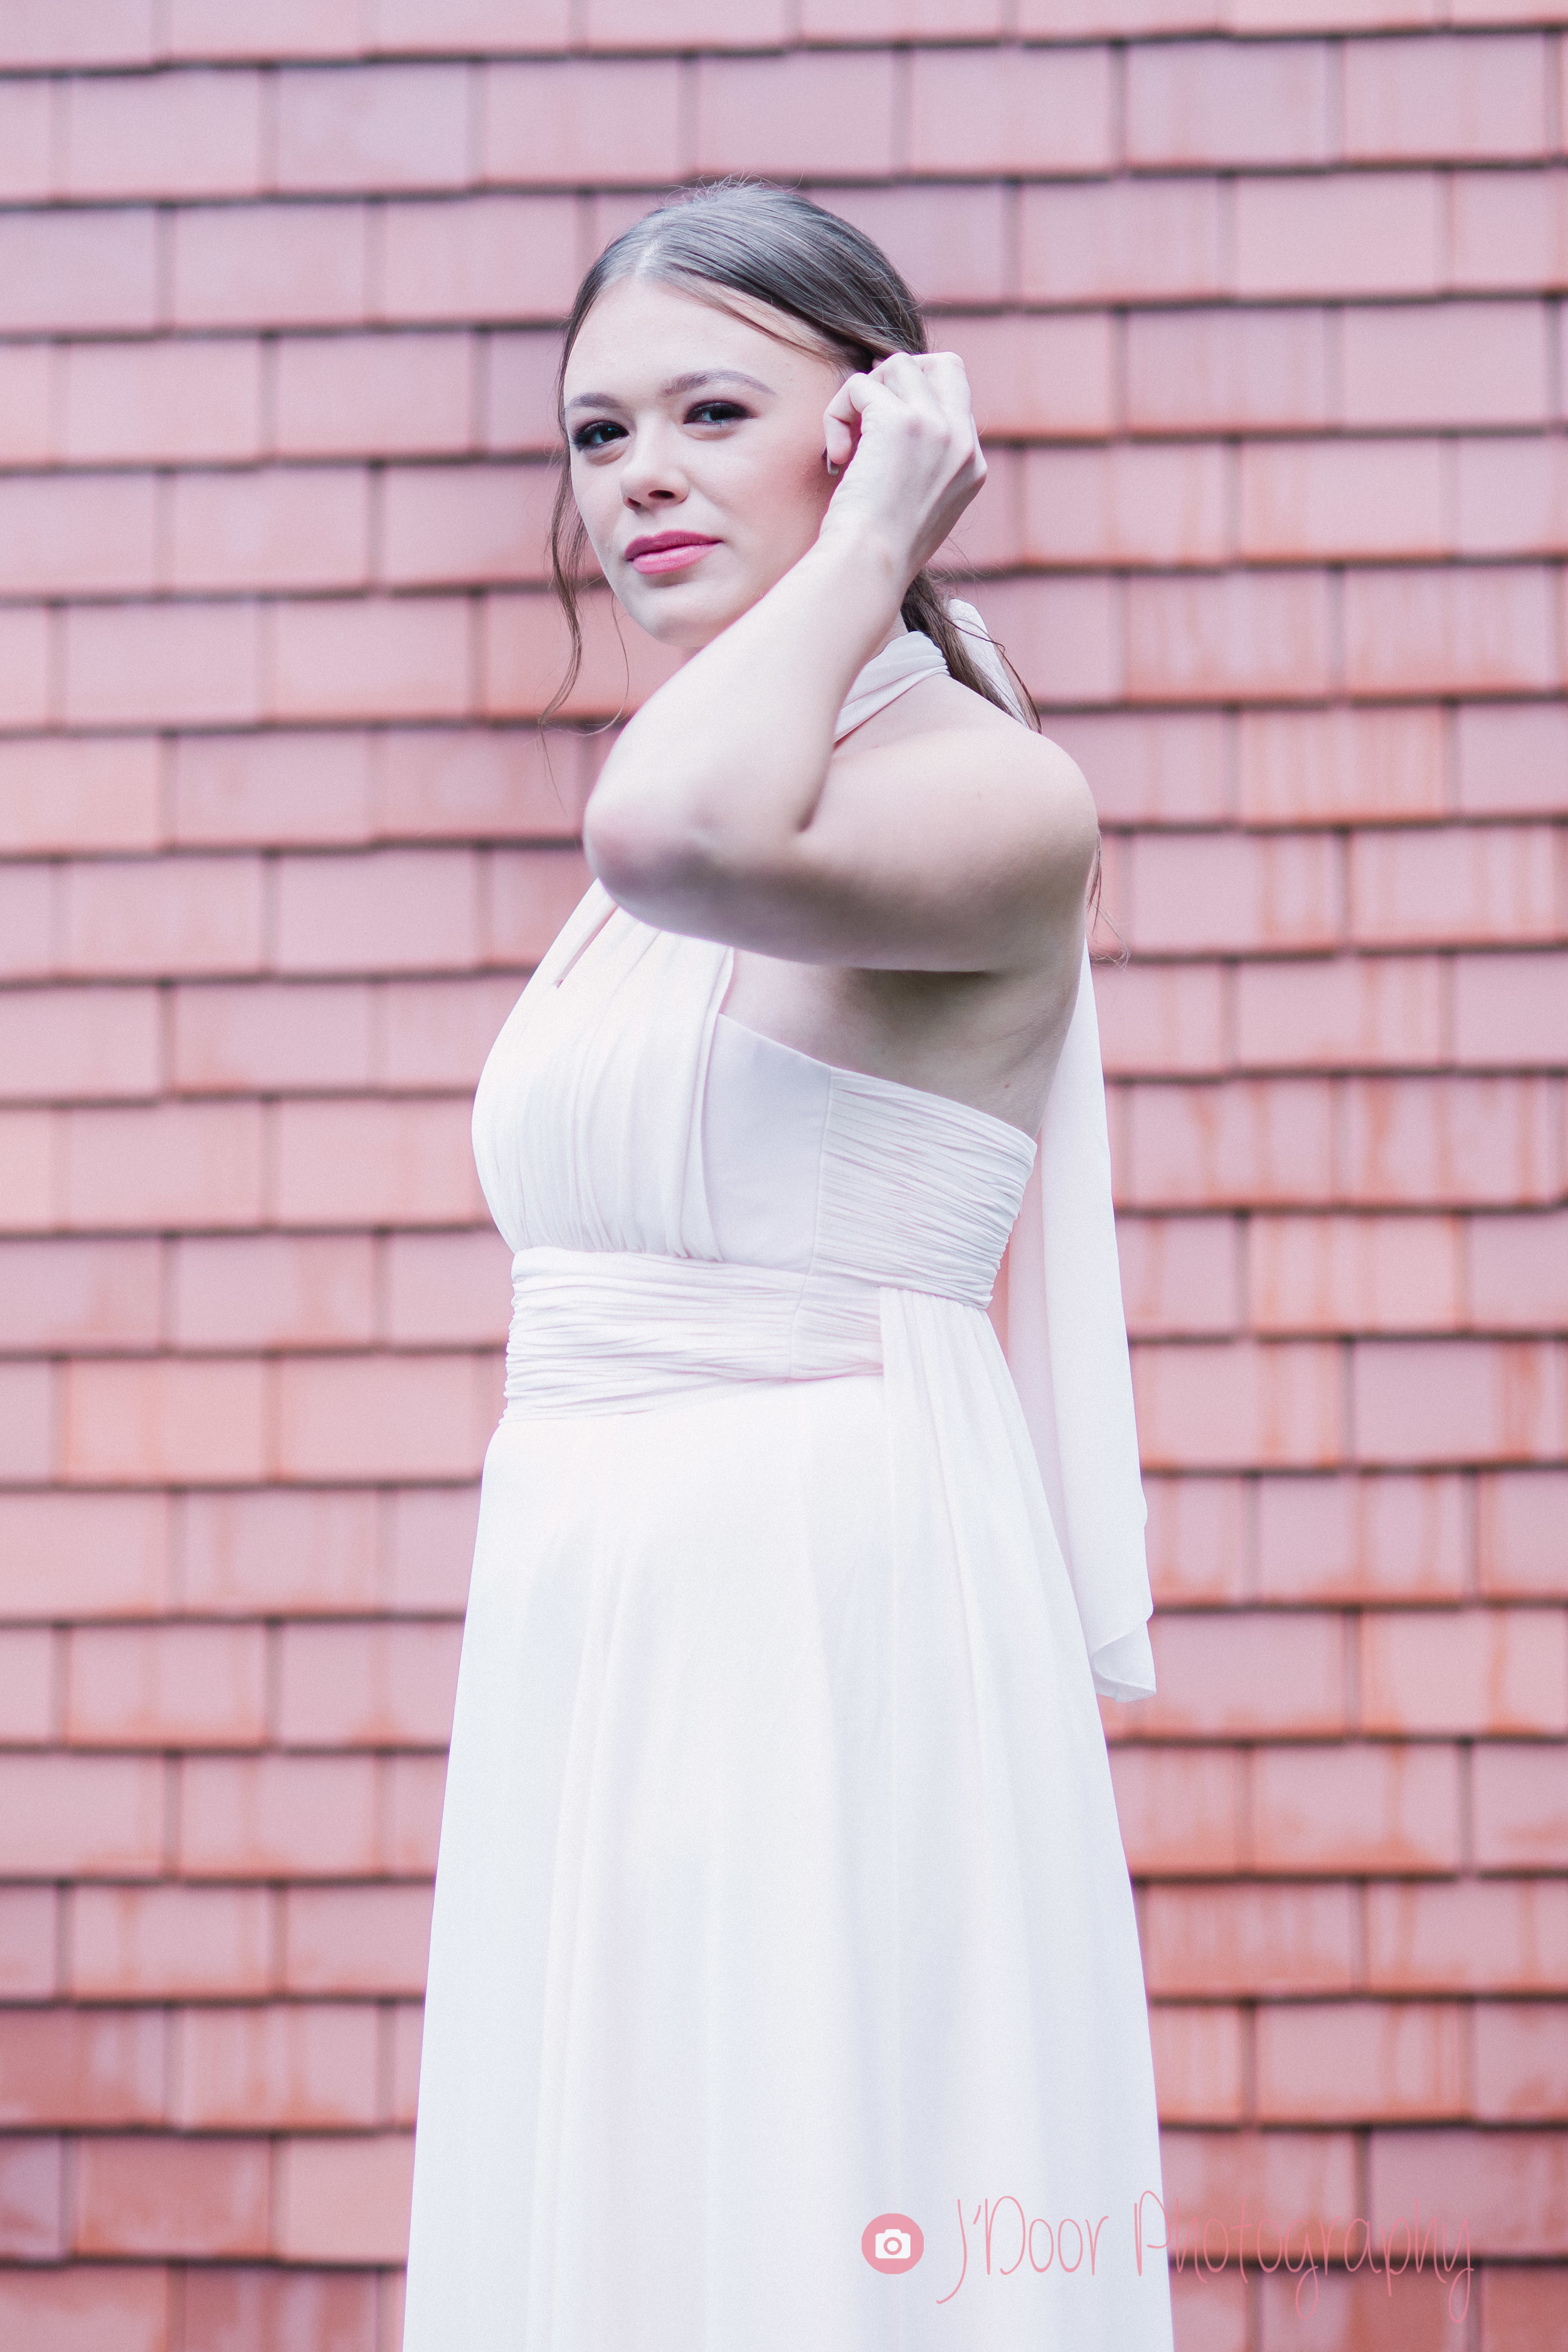 Makeup by Toni Cassidy - Glamavan, Hair by Emma J Hair Styling, Dress by Matchimony, Model Billie.